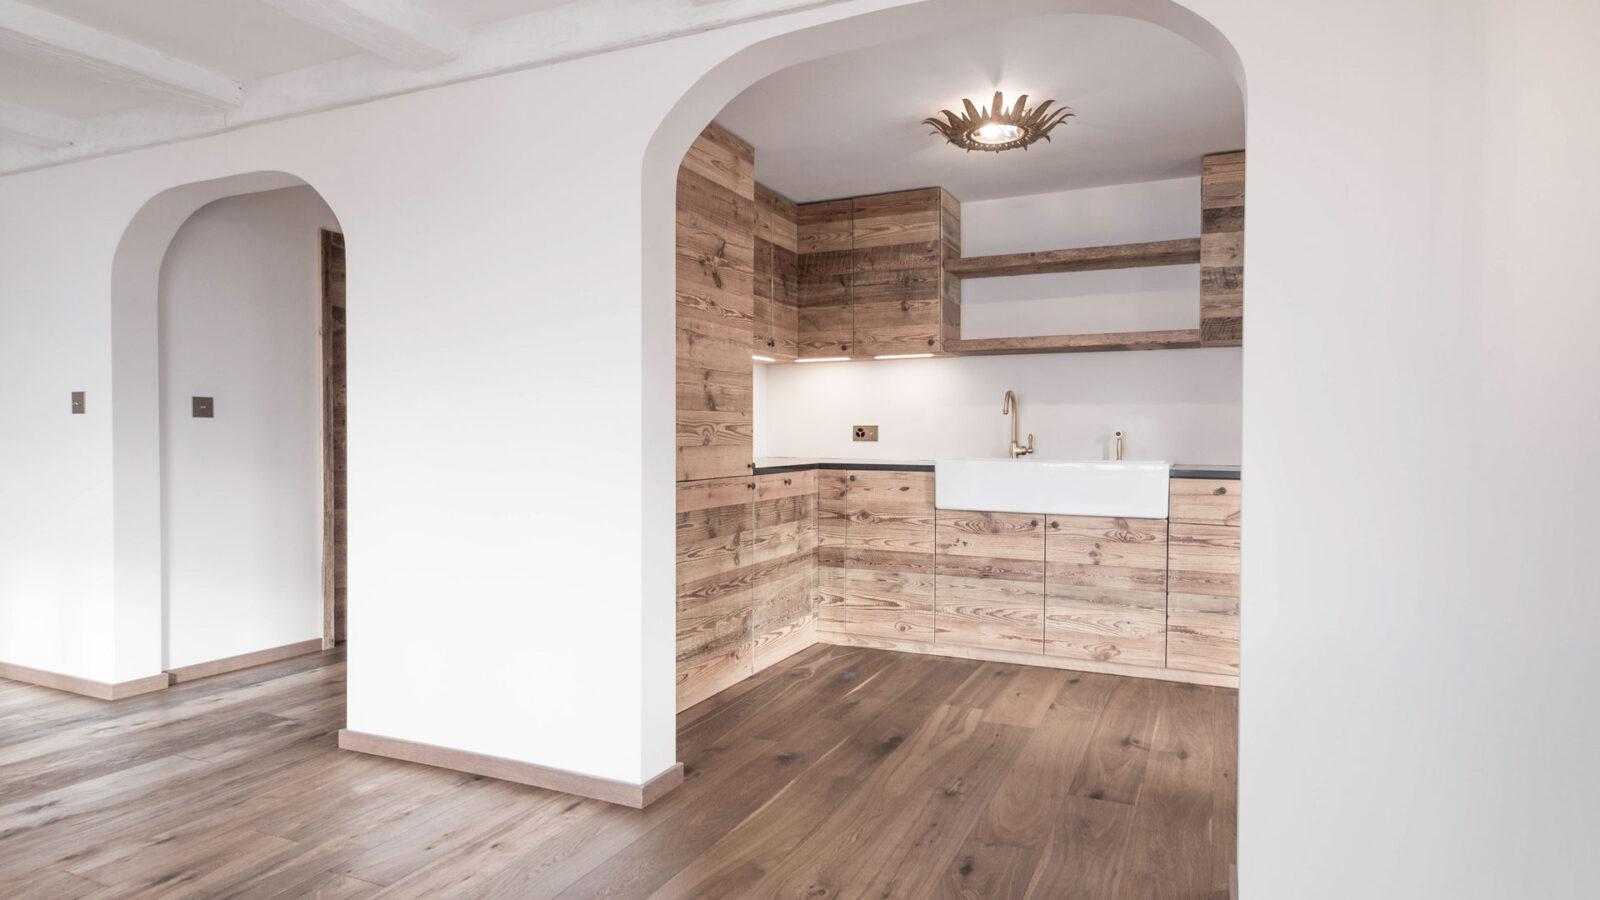 CSDK - Appartement - Verbier - Transformation - Cuisine - 1